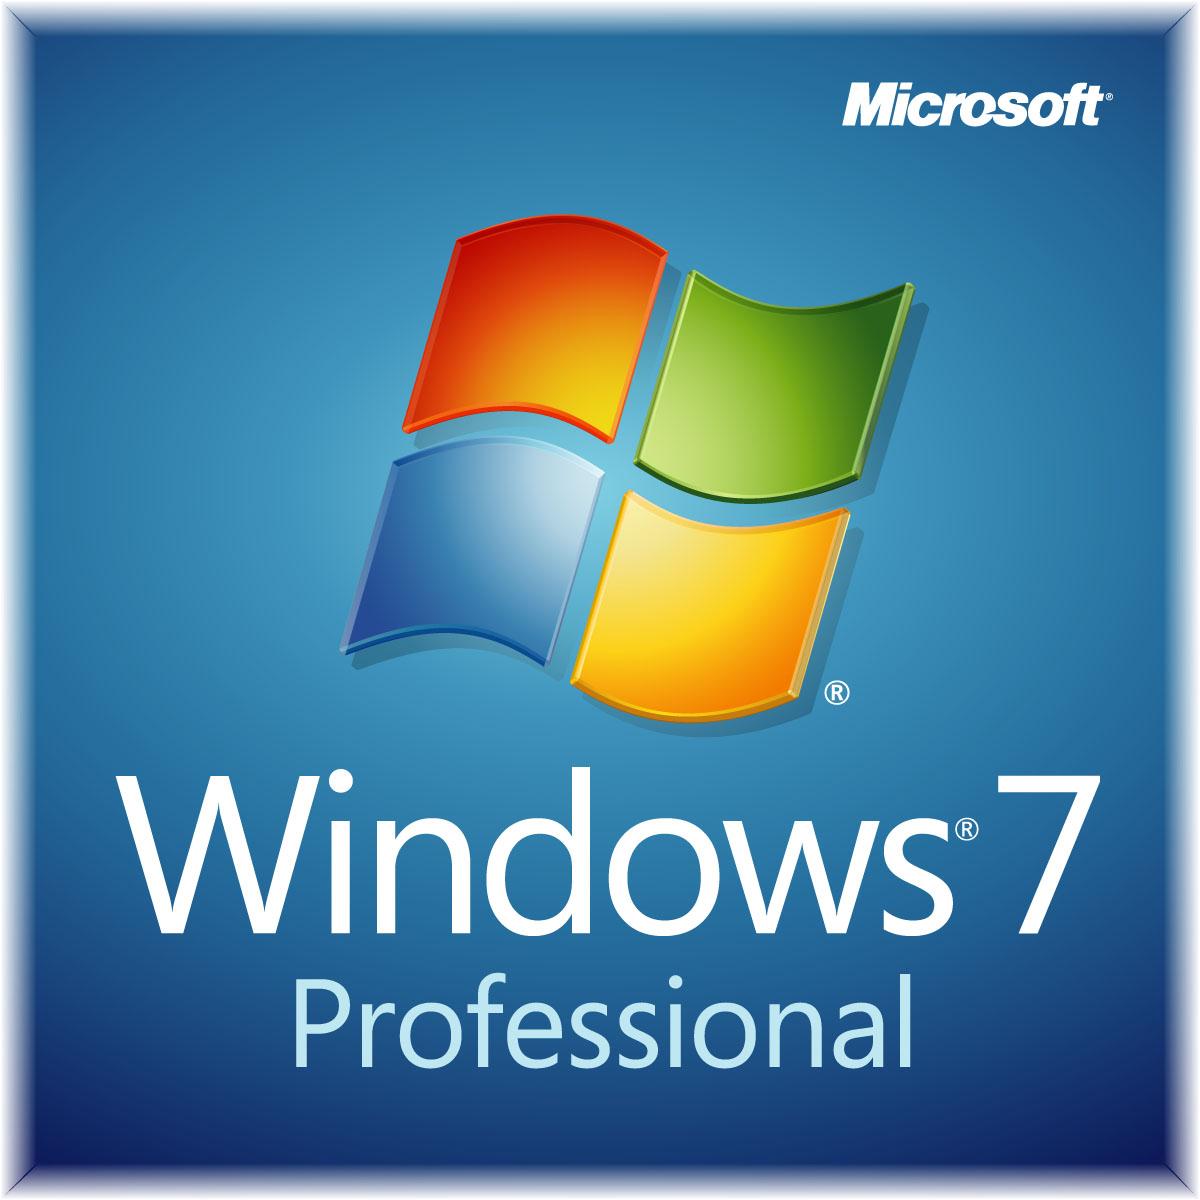 Microsoft Windows 7 Professional, SP1, x32/x64, OEM, DSP, DVD, ENG